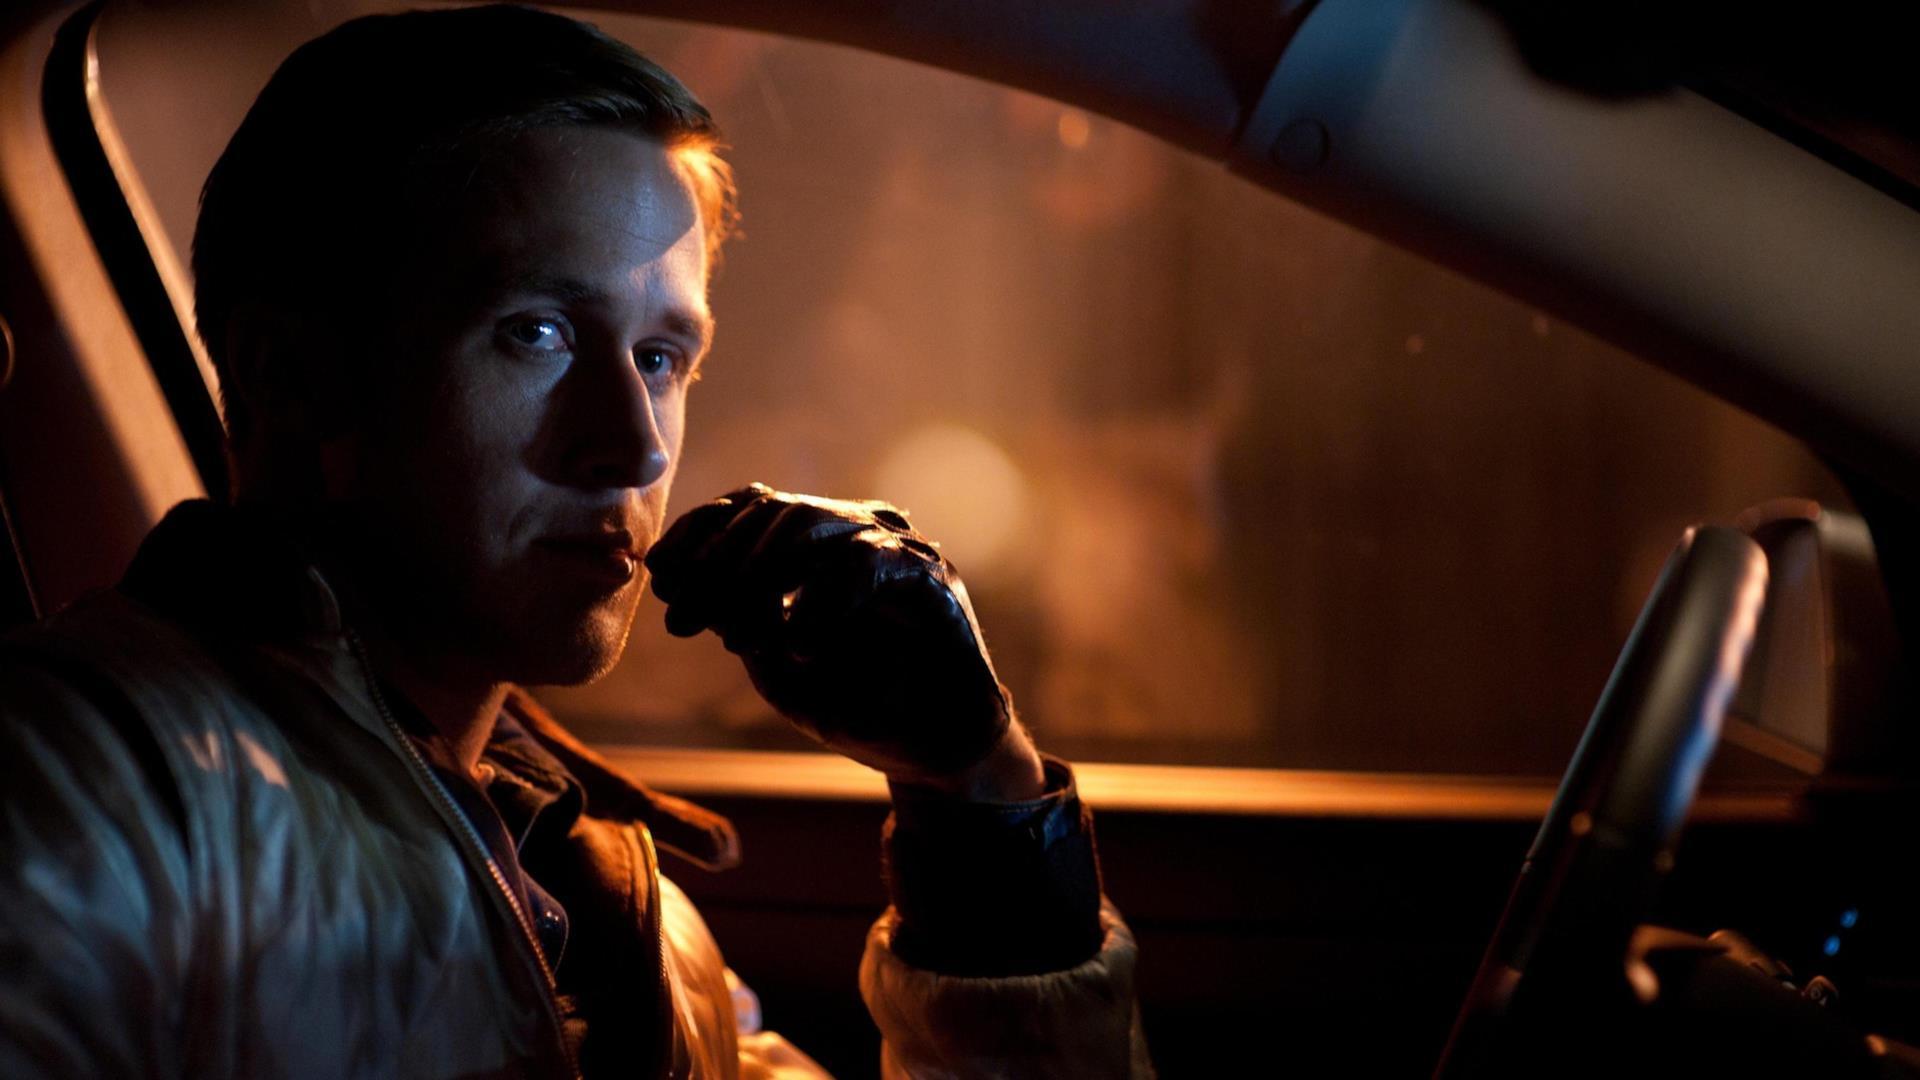 Ryan Gosling interpreta il pilota in Drive (2011)